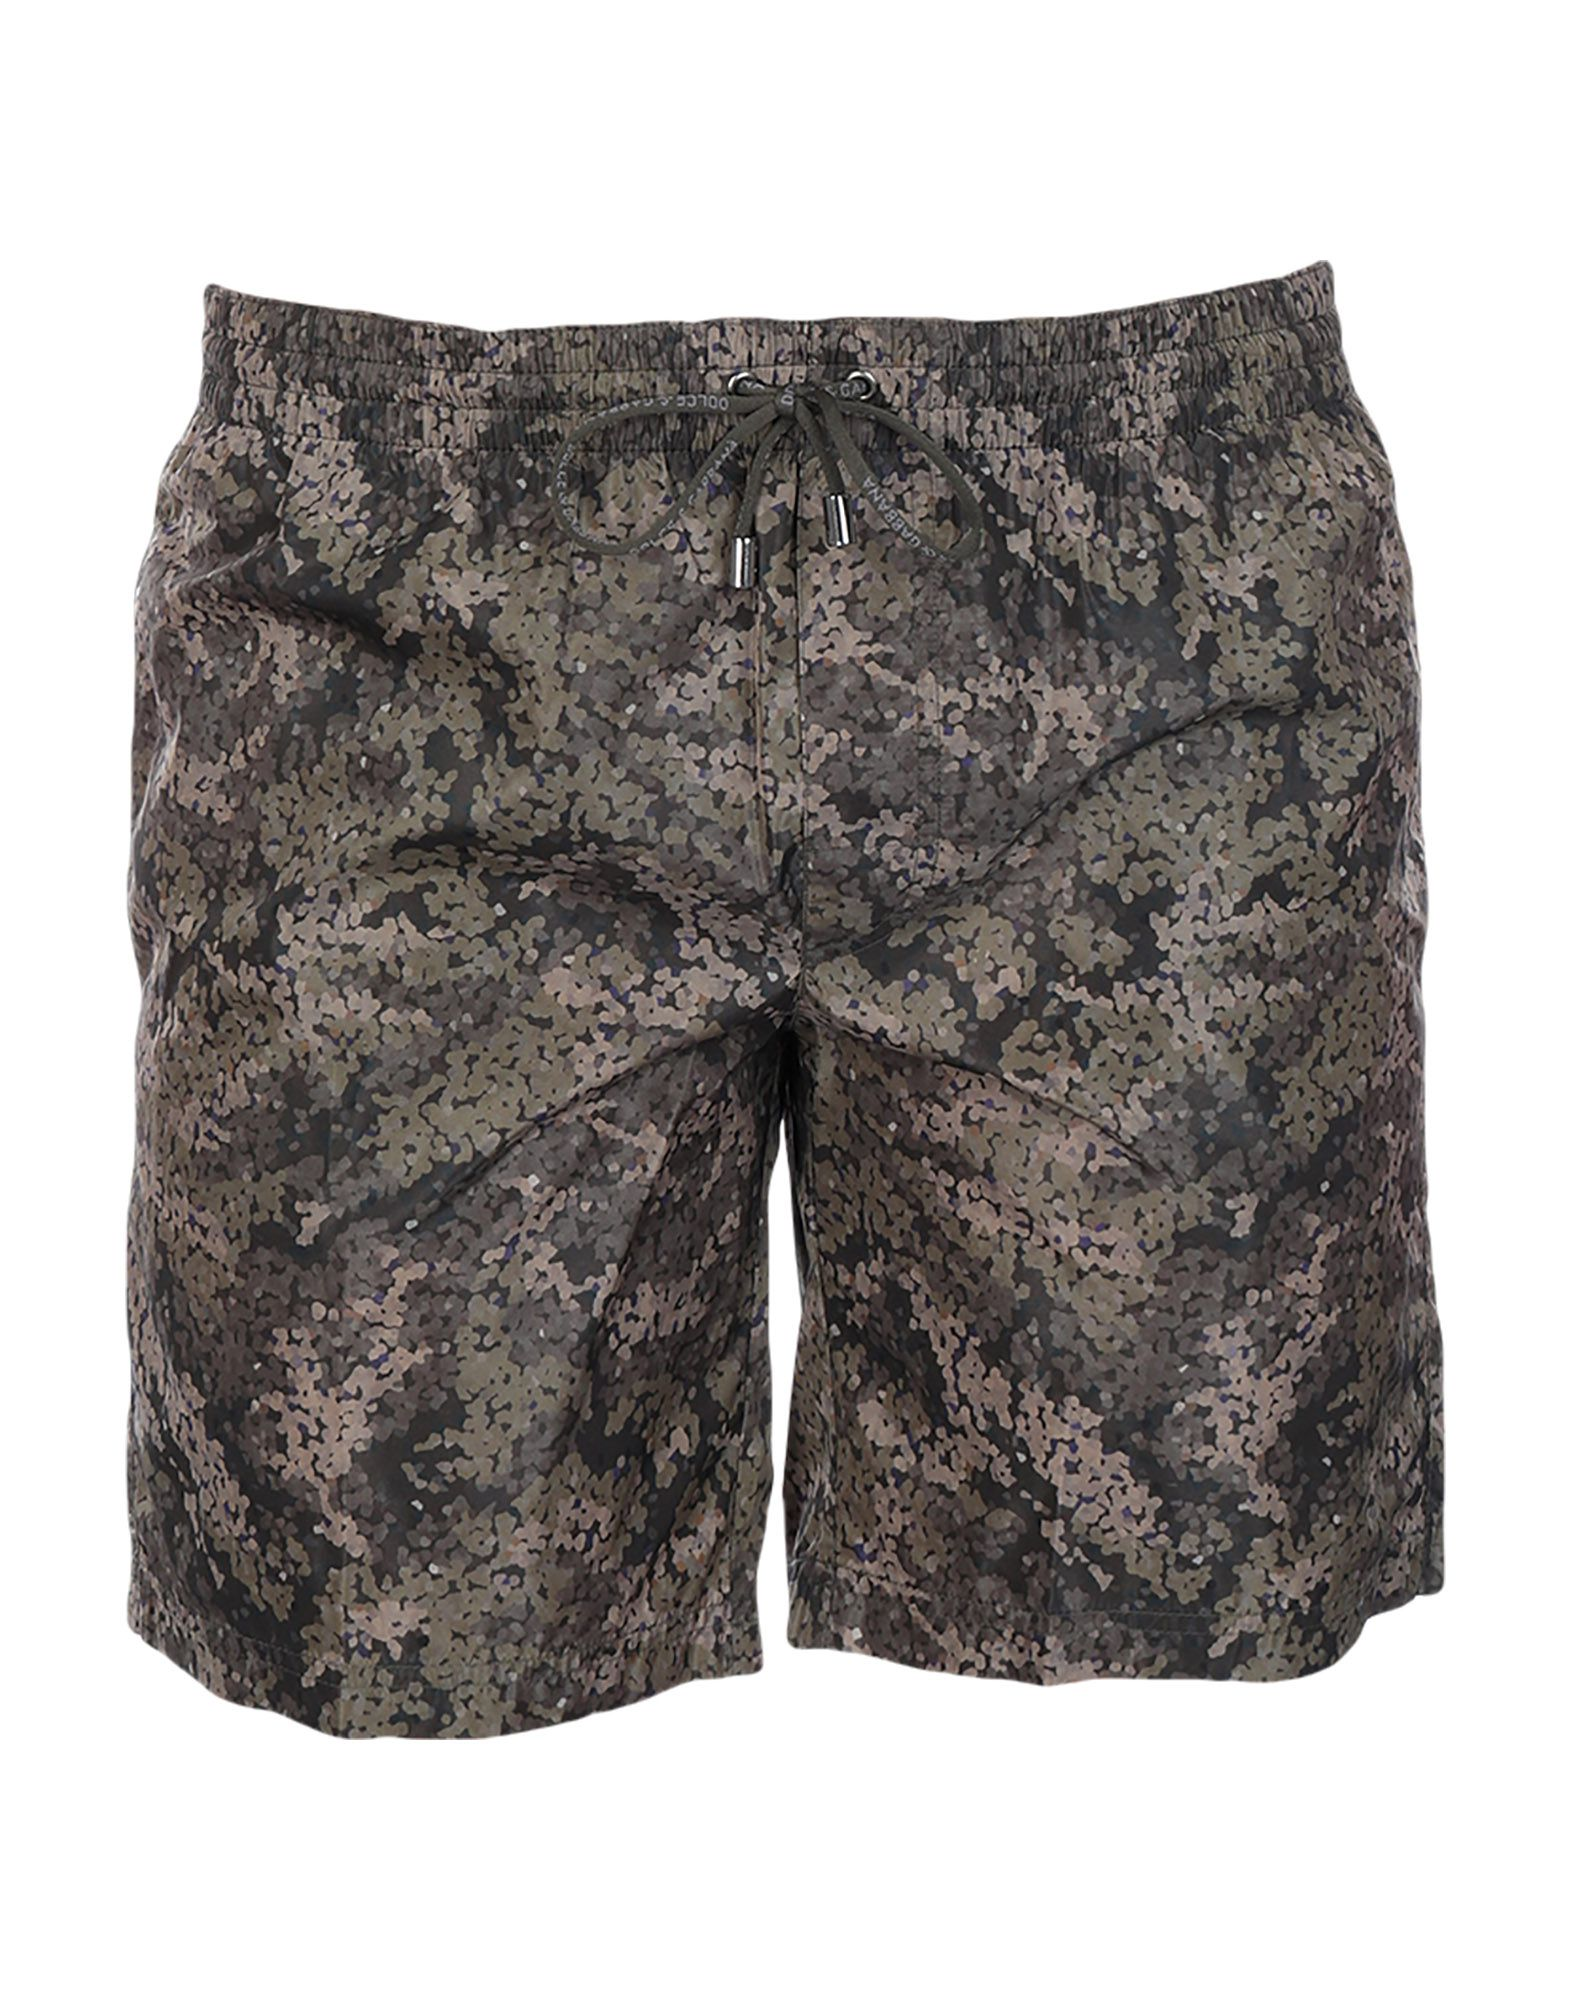 DOLCE & GABBANA BEACHWEAR Шорты для плавания move beachwear шорты для плавания